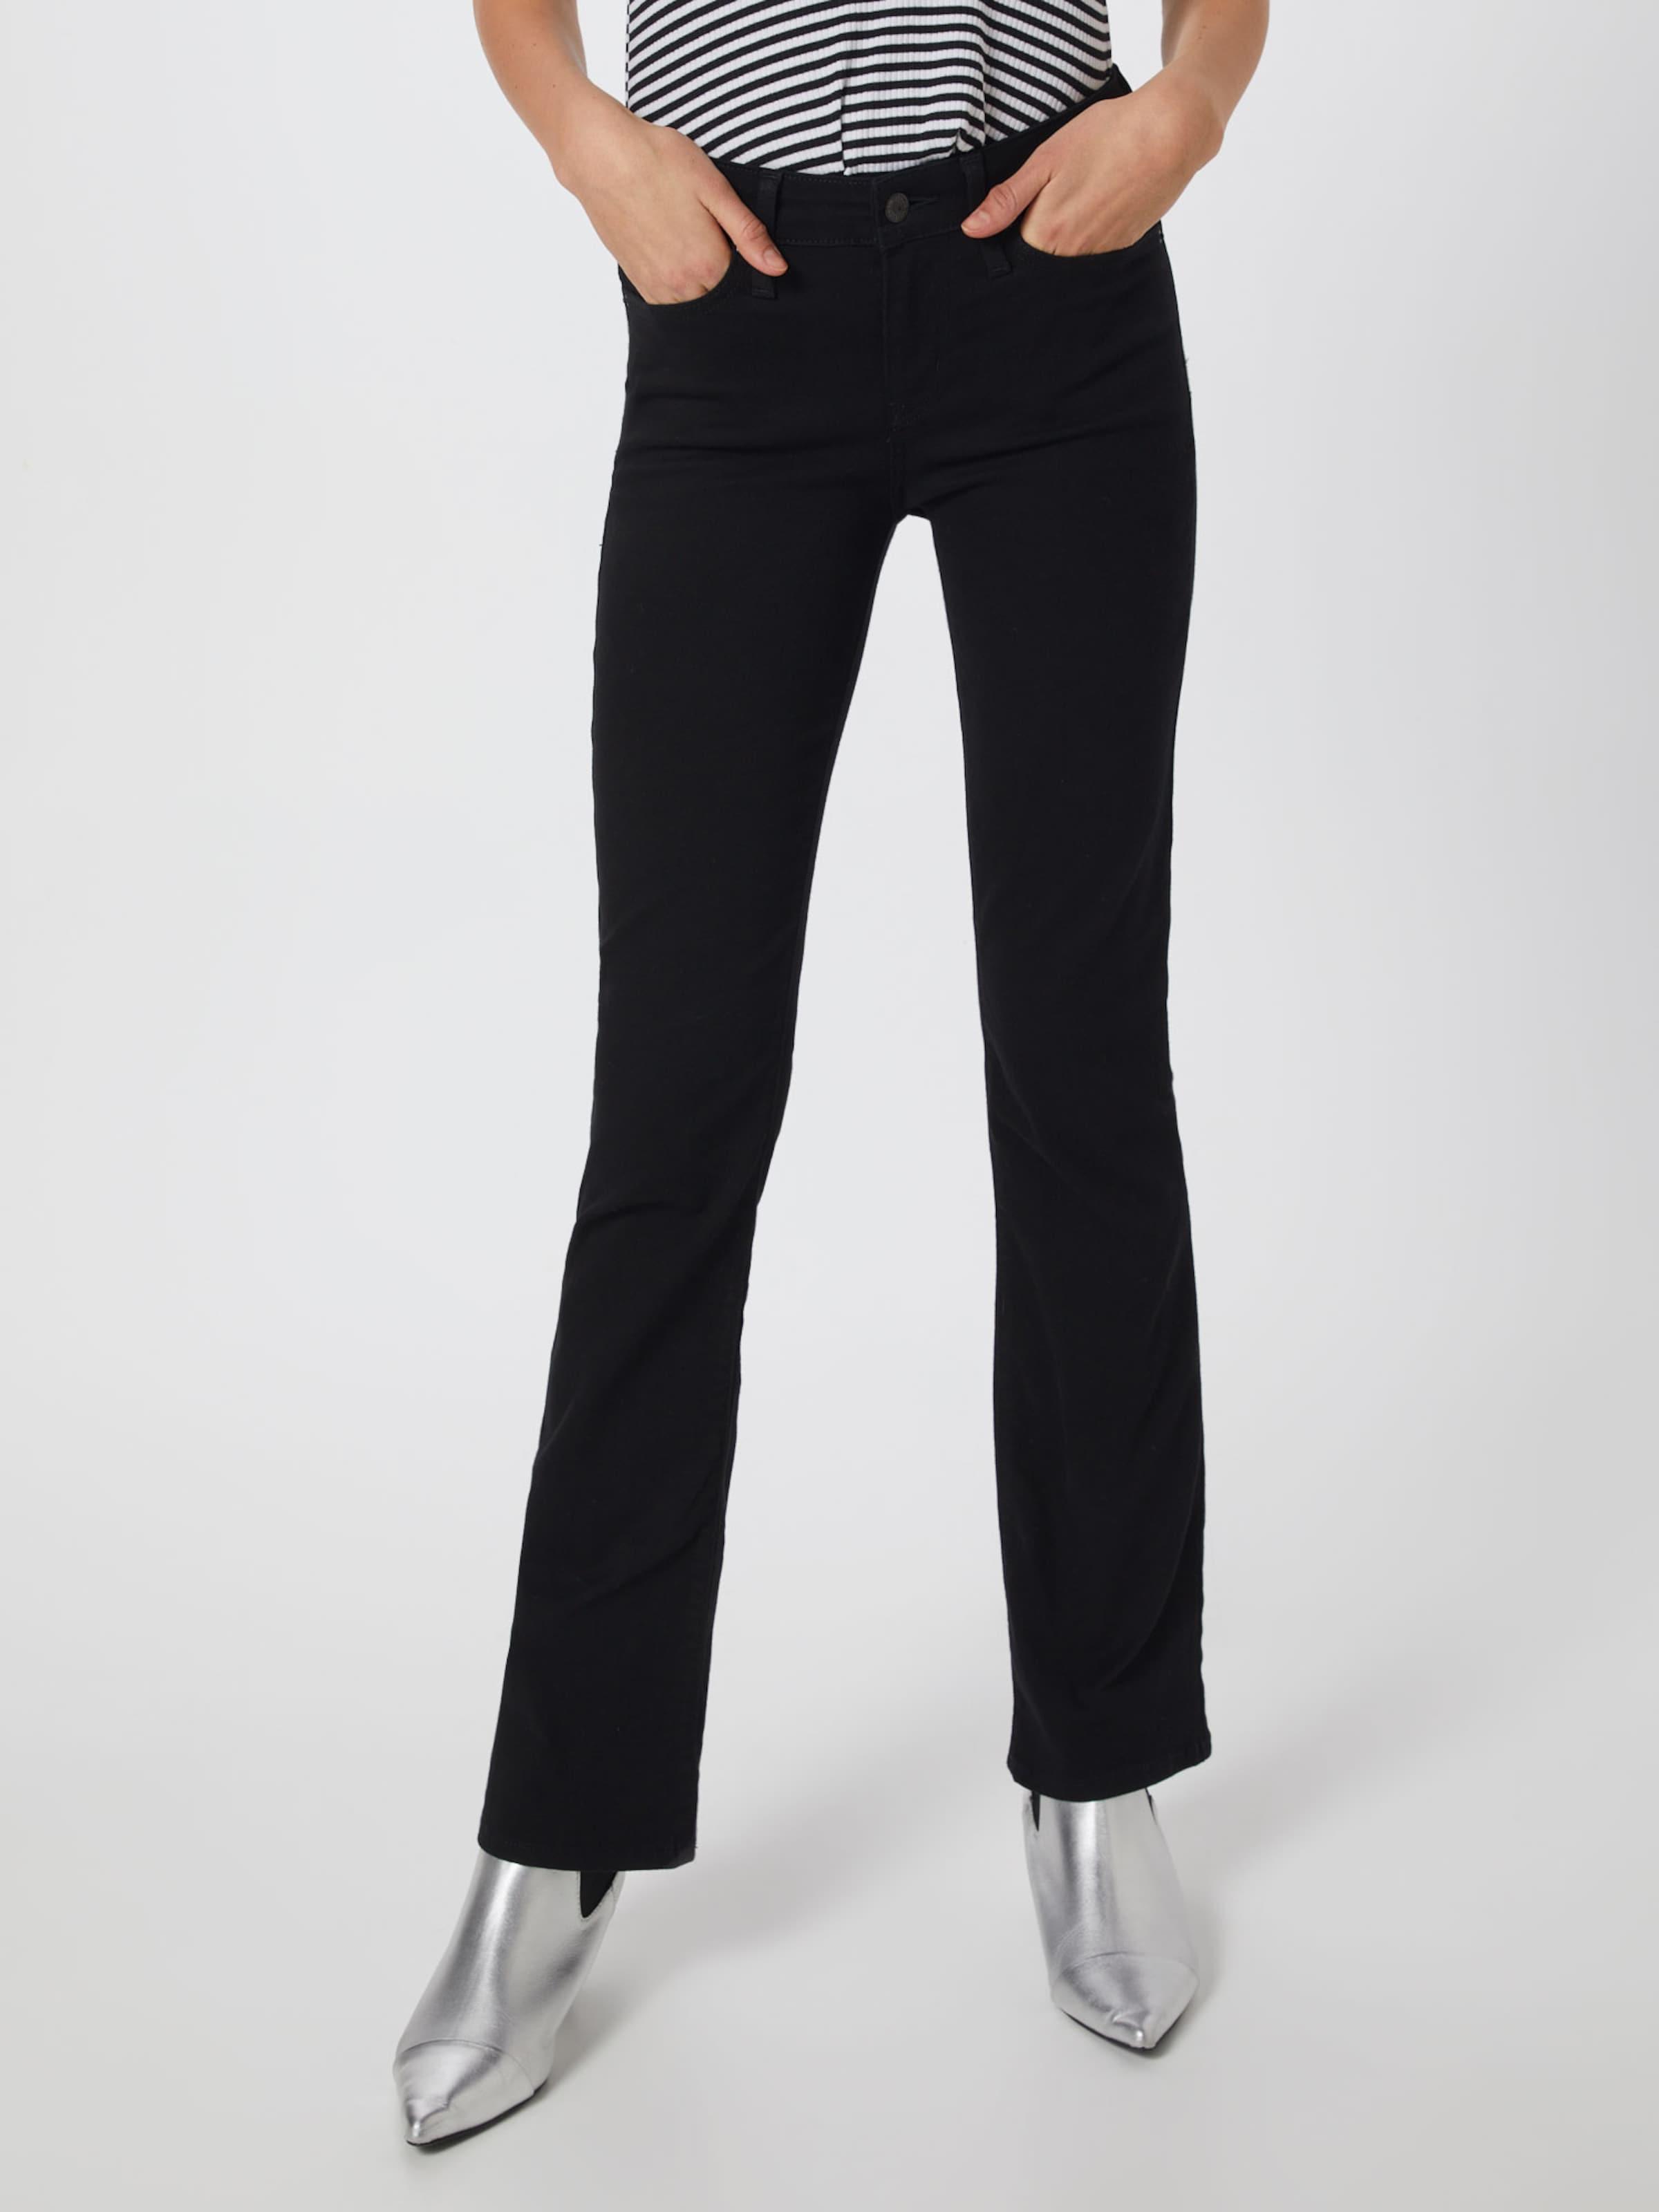 '715� In Schwarz bootcut' Jeans Levi's jUzSMVGqpL